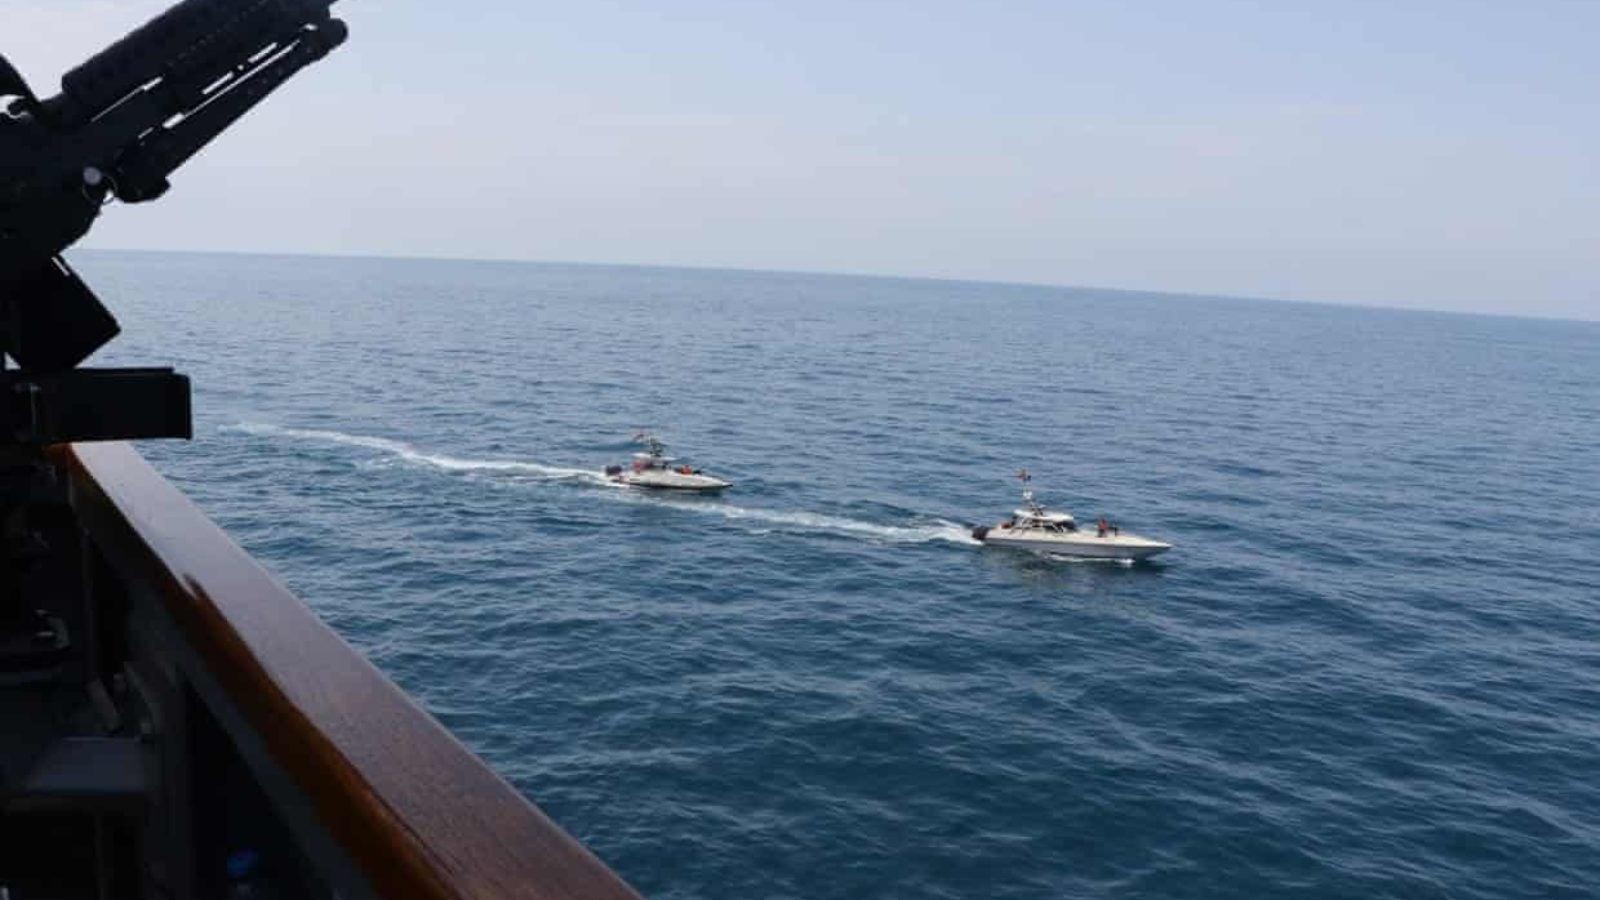 Two small Iranian vessels sail close to a U.S. Navy ship